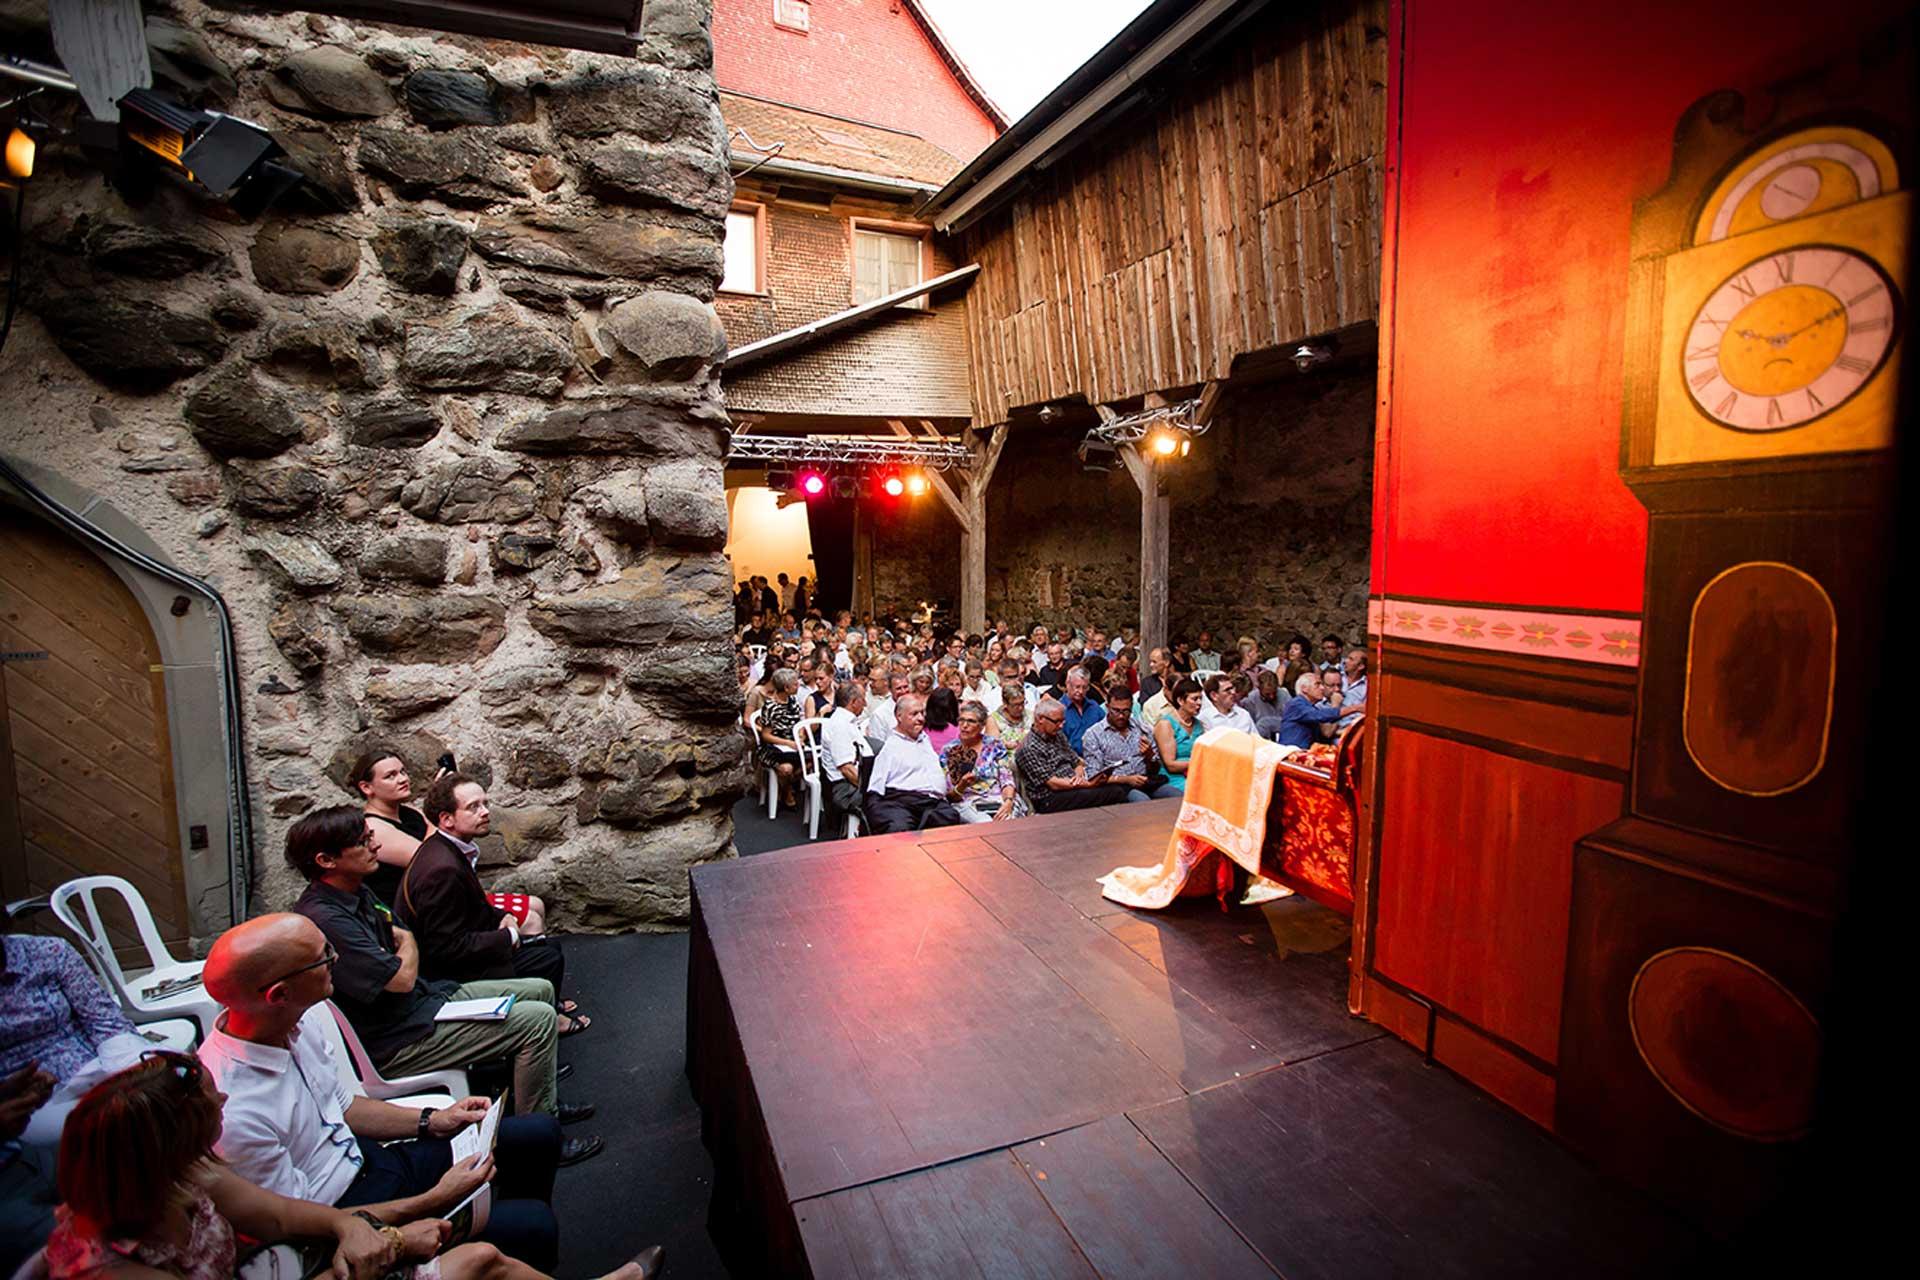 SchlossfestspieleHagenwil_02.jpg